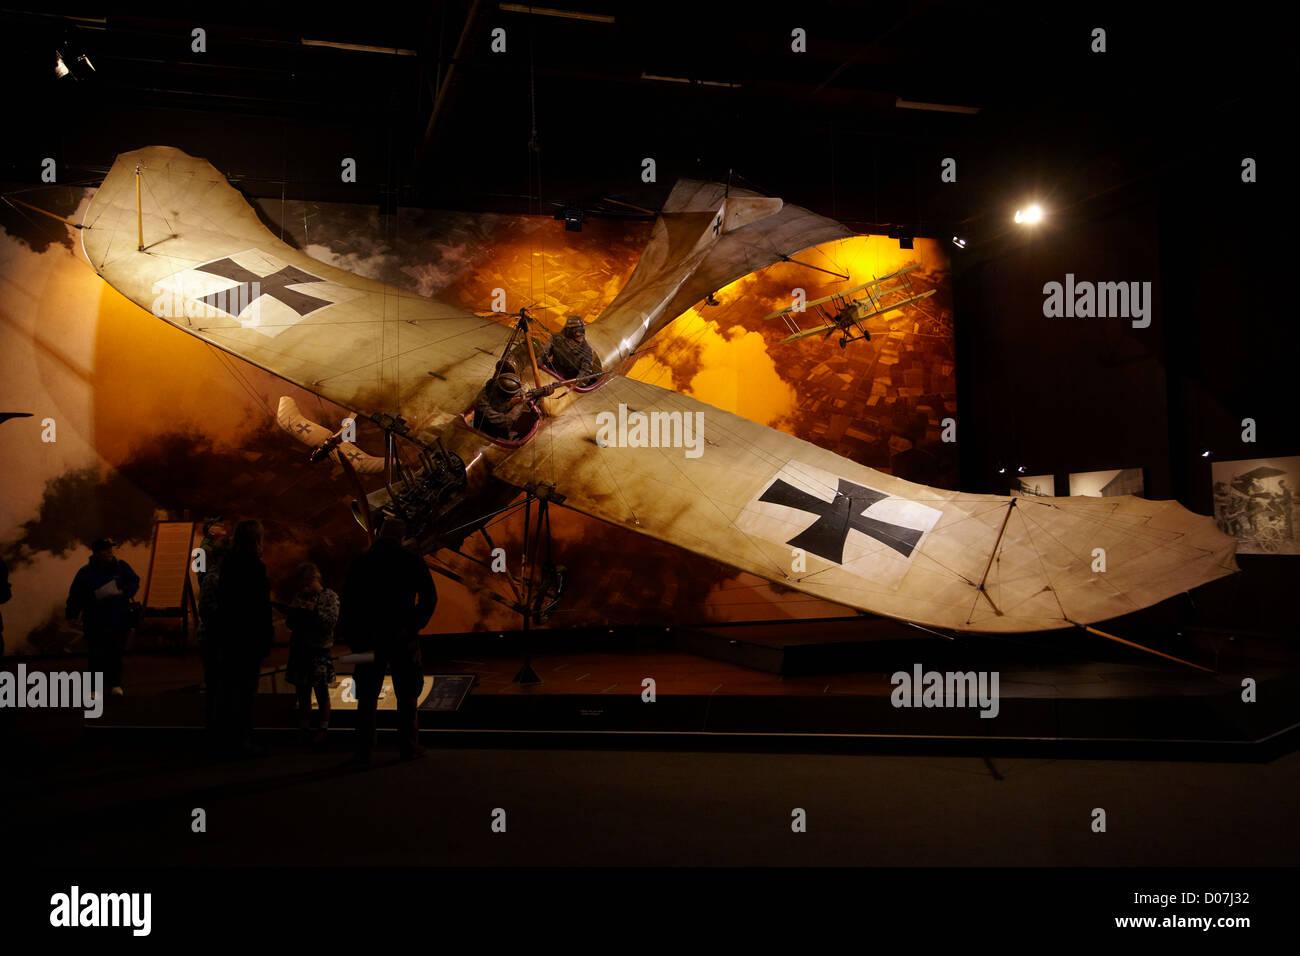 Etrich Taube monoplane, Omaka Aviation Heritage Centre, Blenheim, Marlborough, South Island, New Zealand - Stock Image